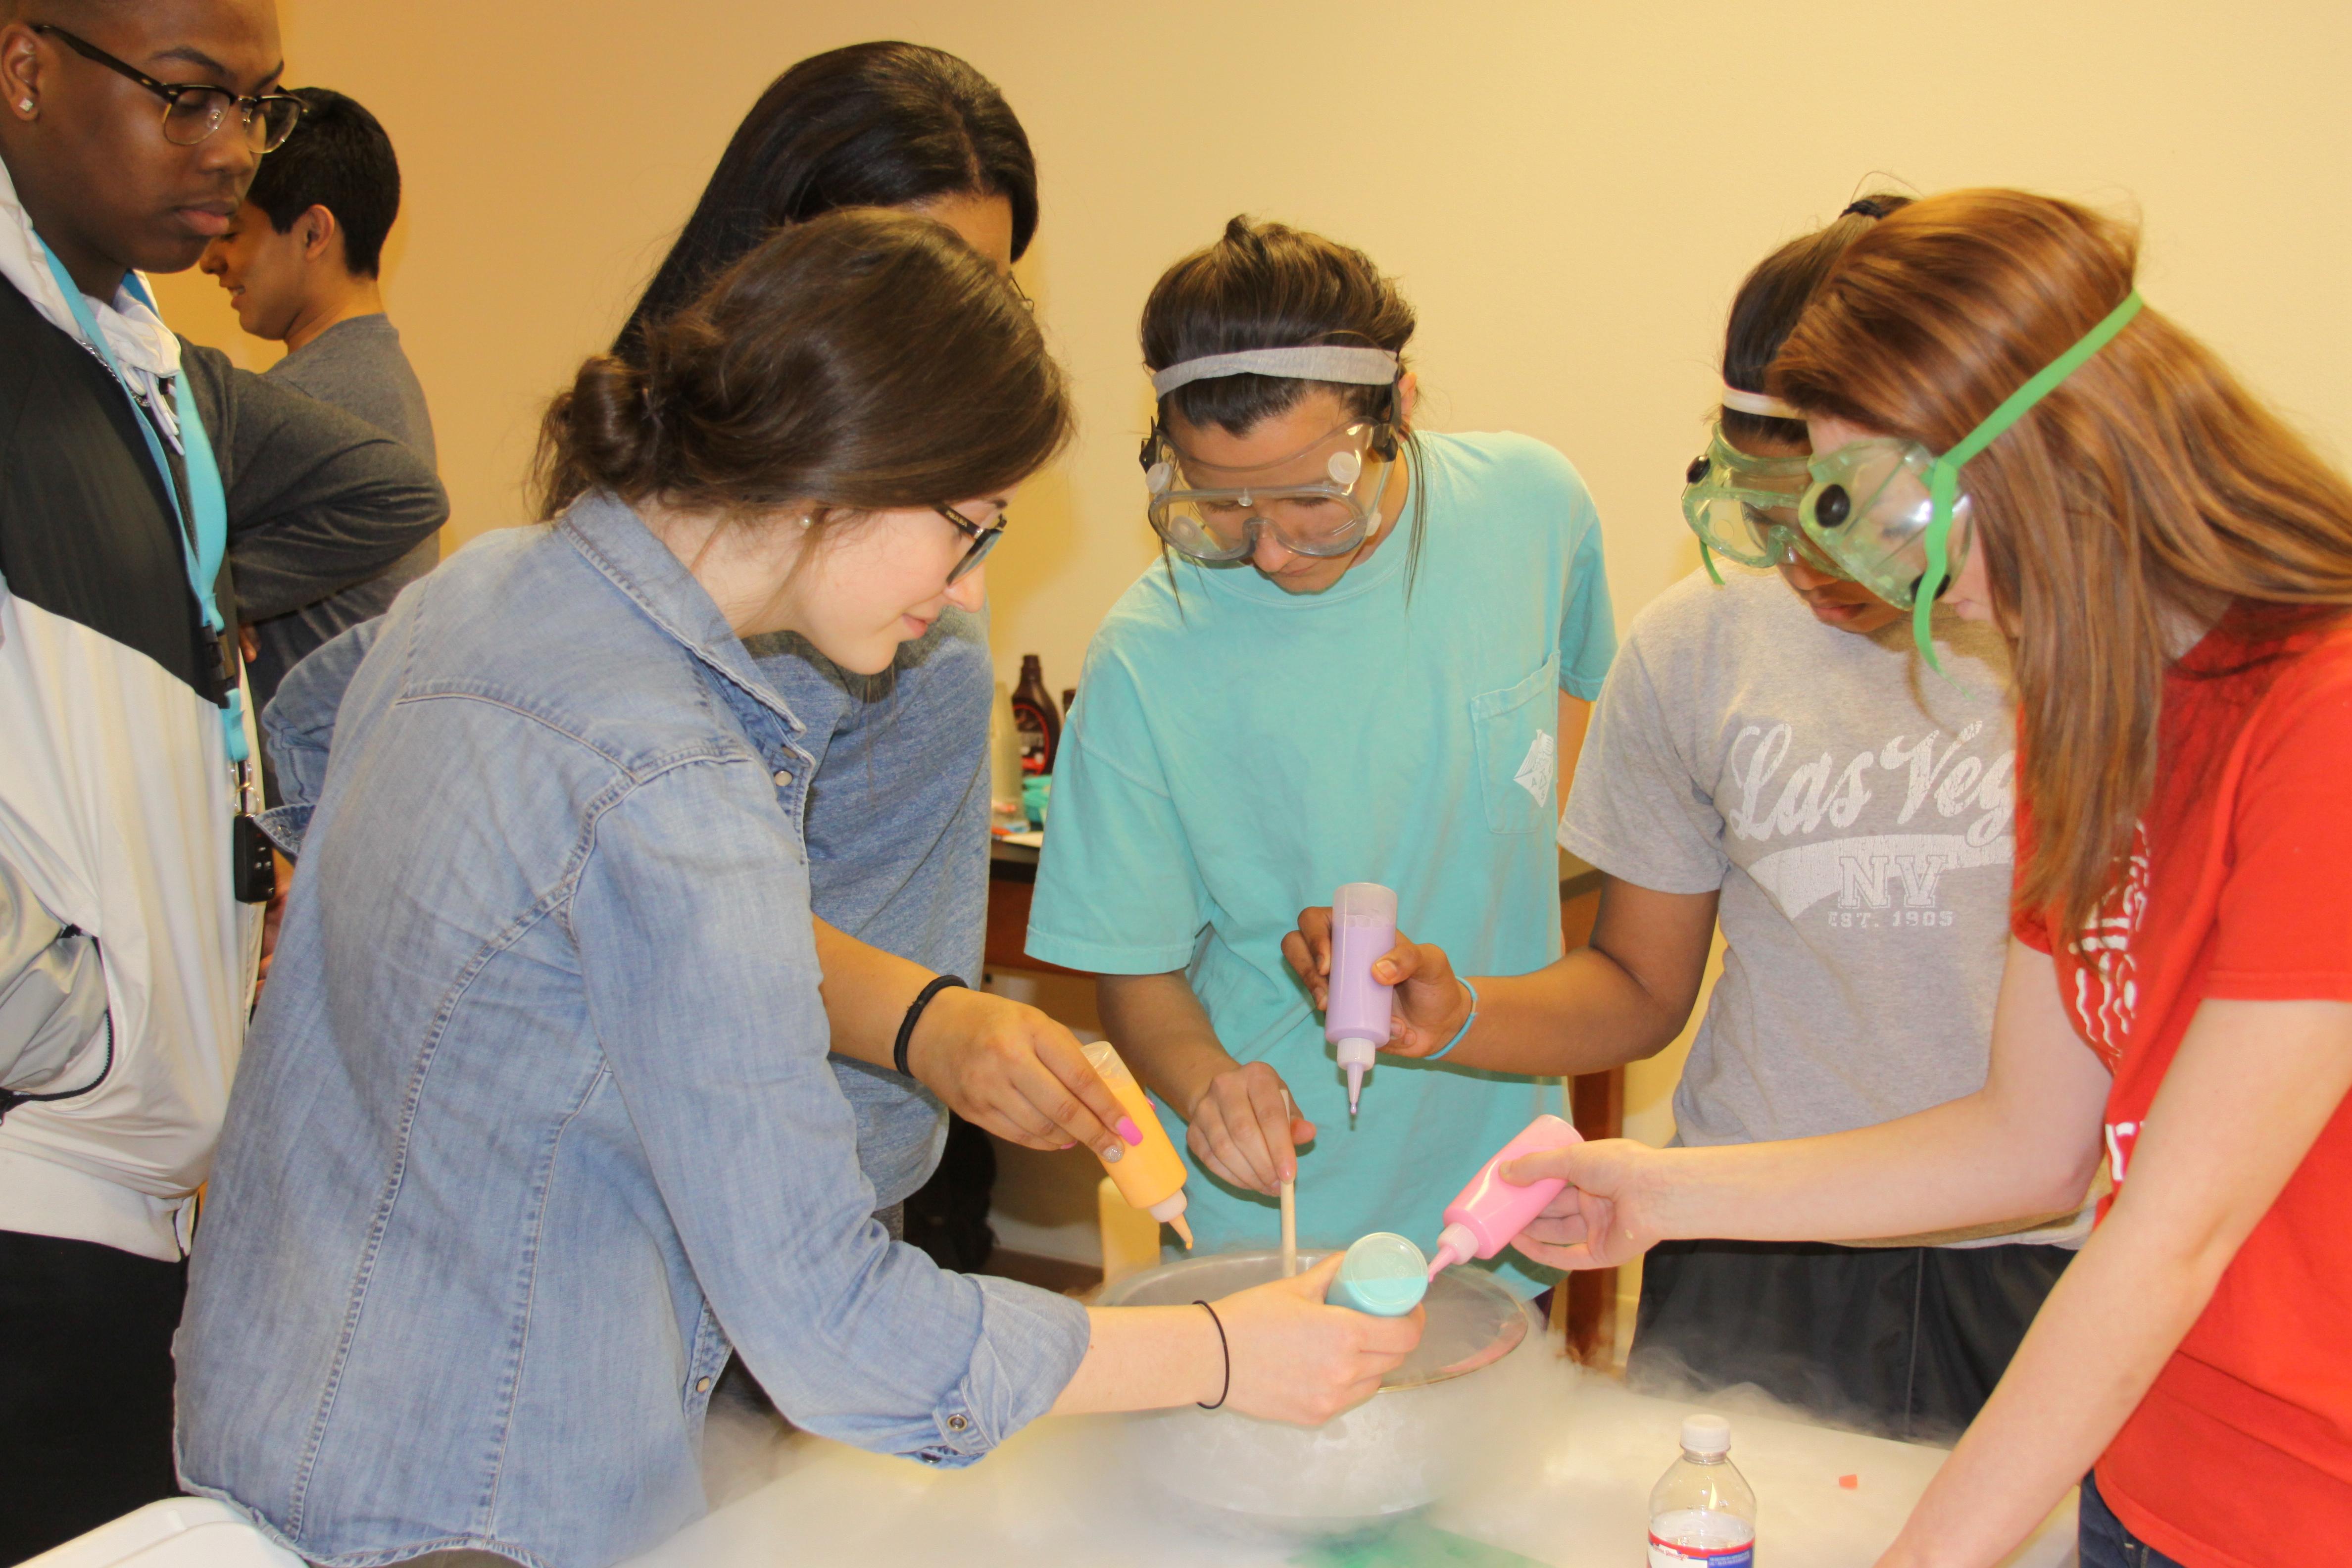 Waco Teen Science Cafe 1